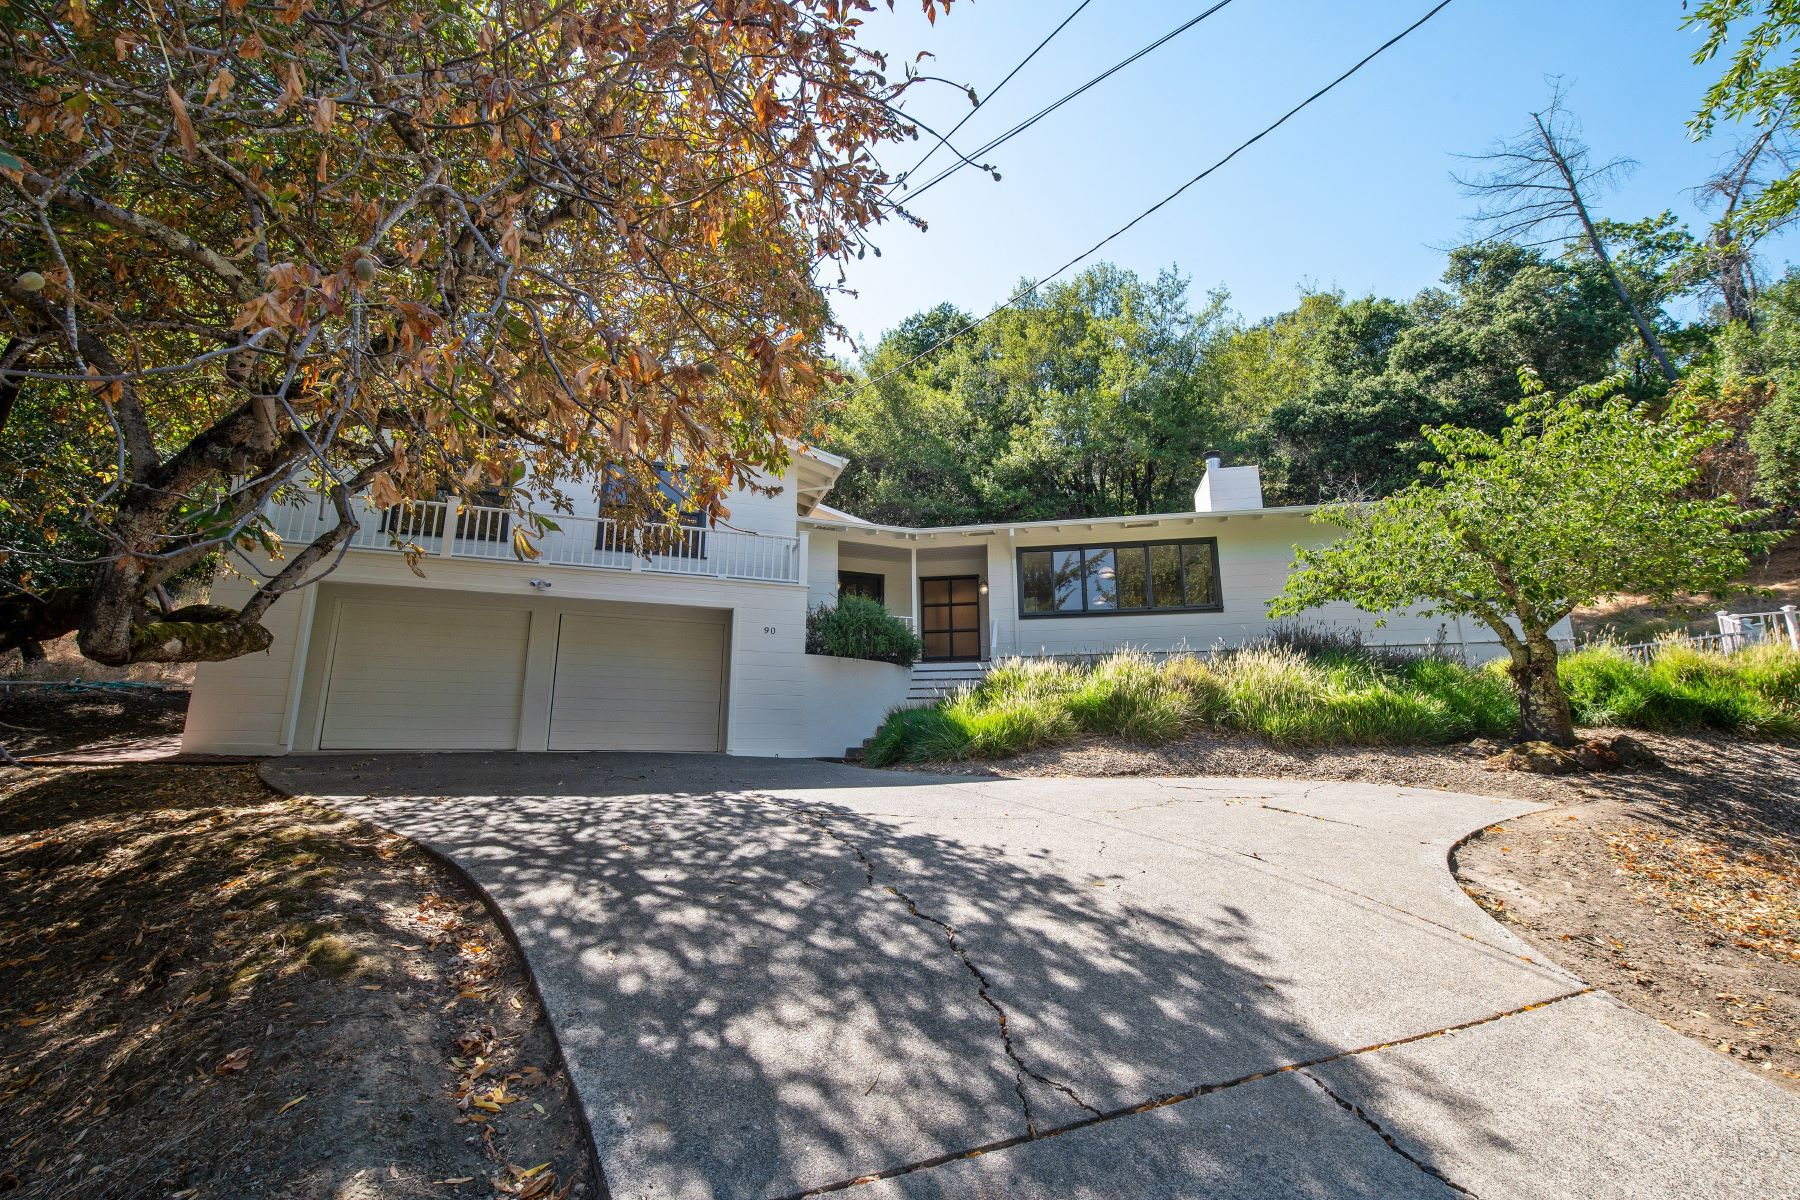 Single Family Homes のために 売買 アット Peaceful Modern Home in Sleepy Hollow 90 Legend Road, San Anselmo, カリフォルニア 94960 アメリカ